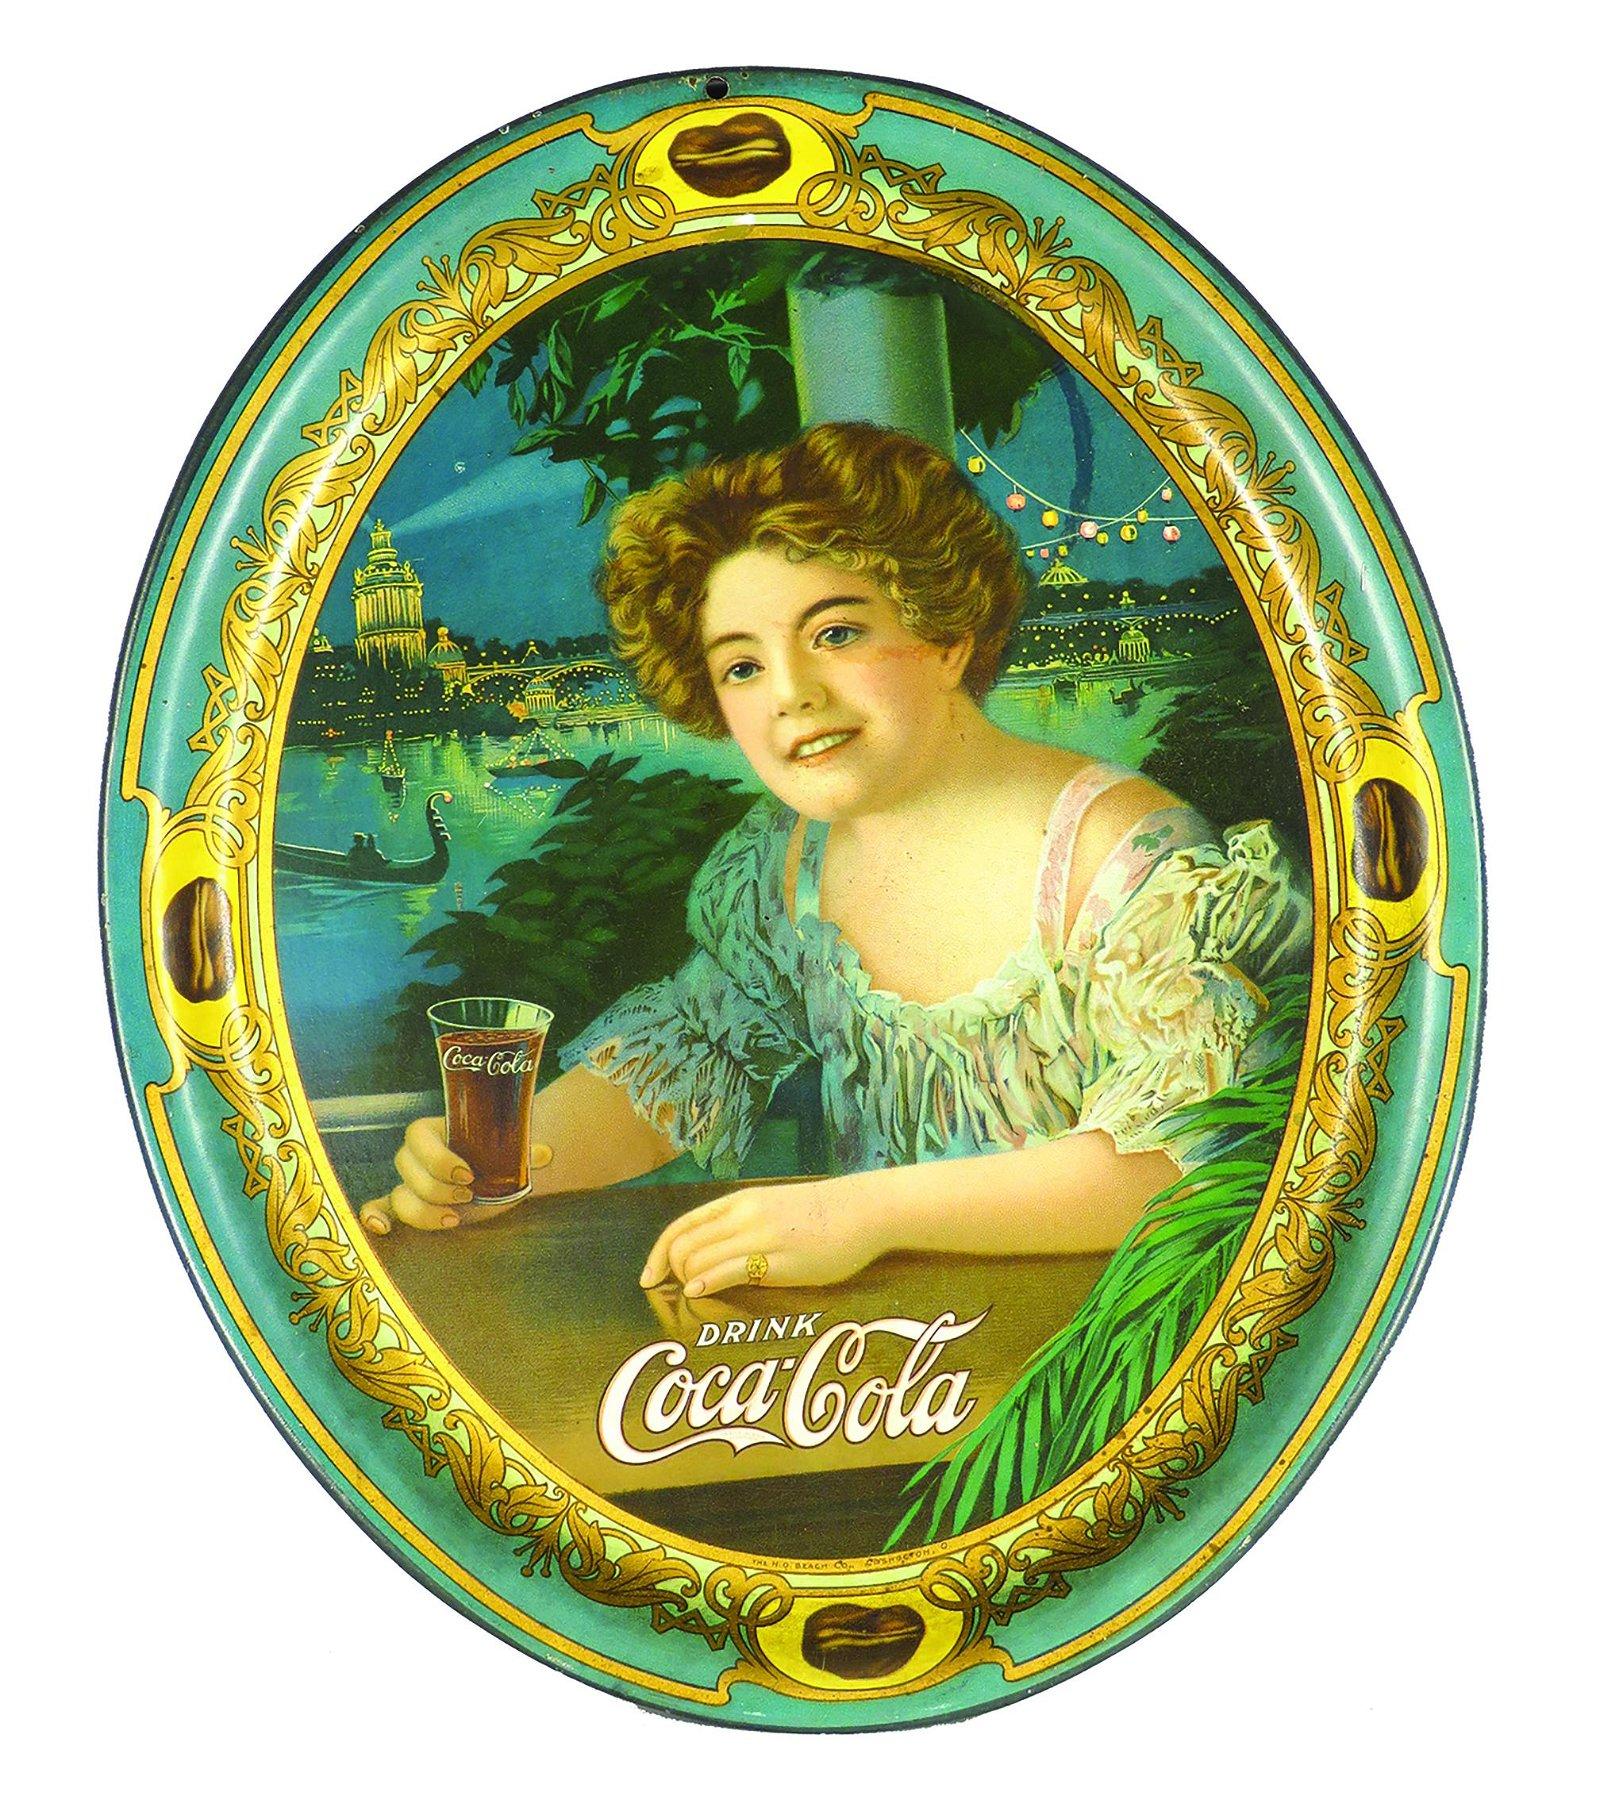 1909 Original Coca Cola Tin Serving Tray